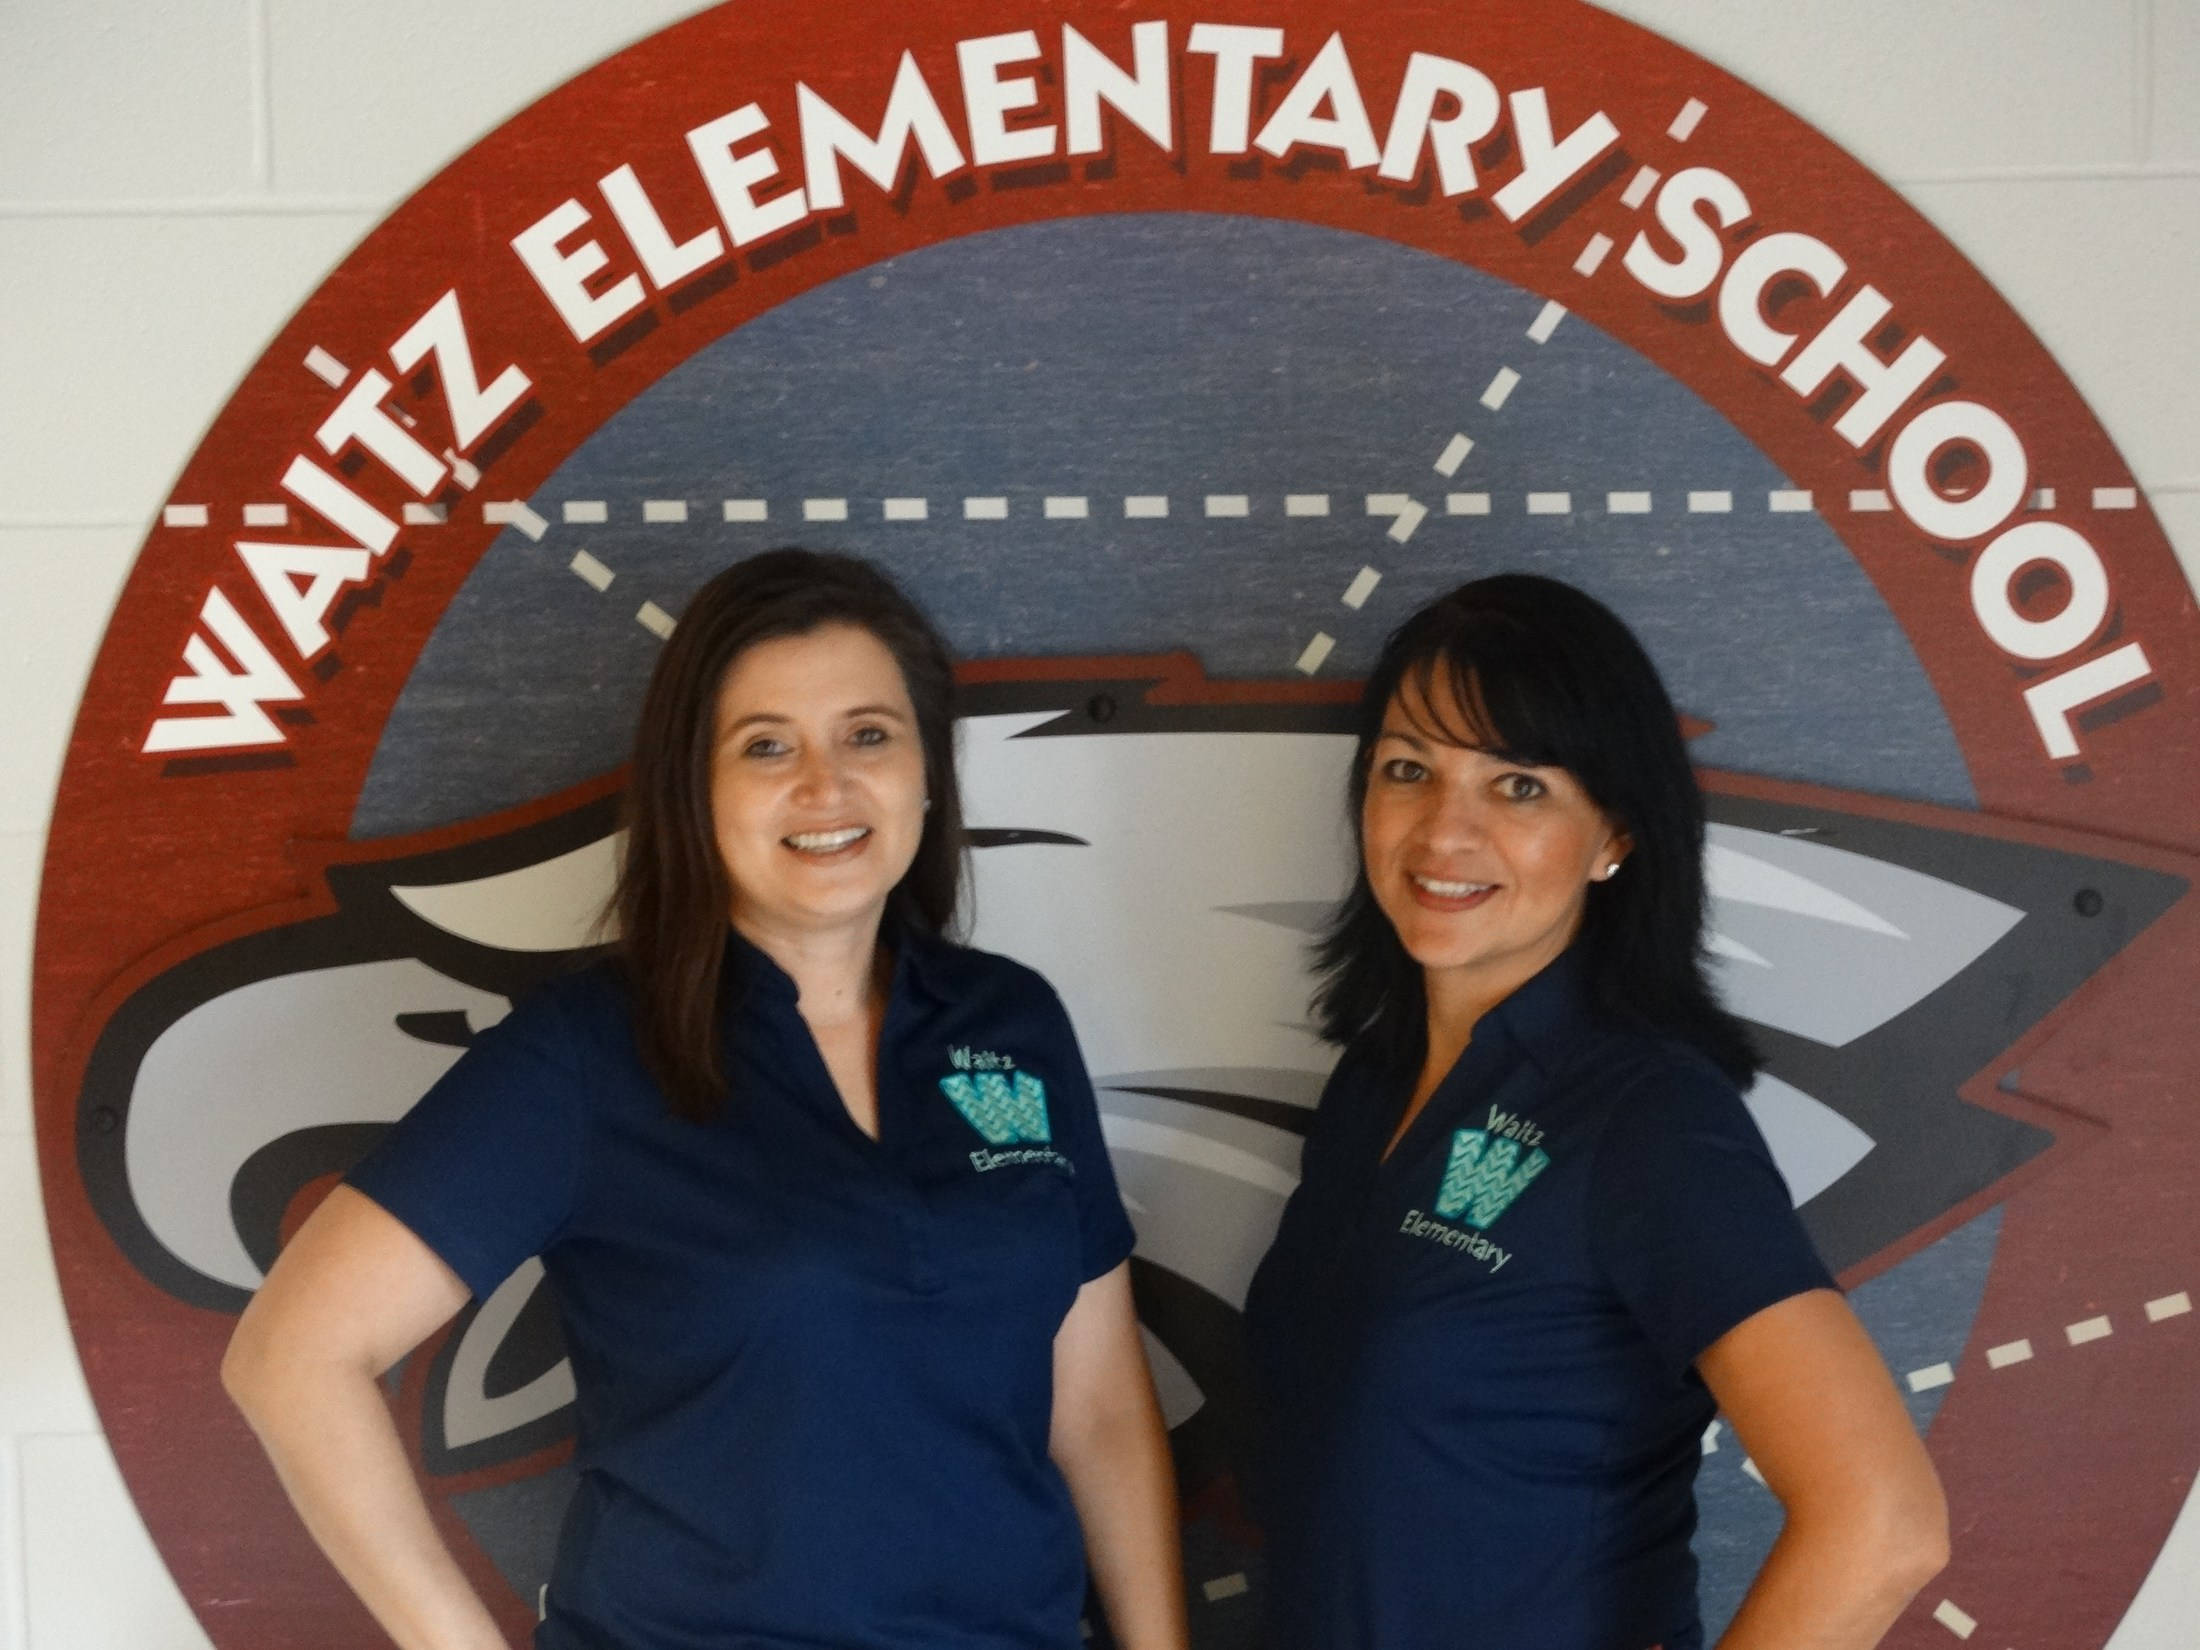 Librarian Mrs. Tanguma and library clerk Mrs. Perez